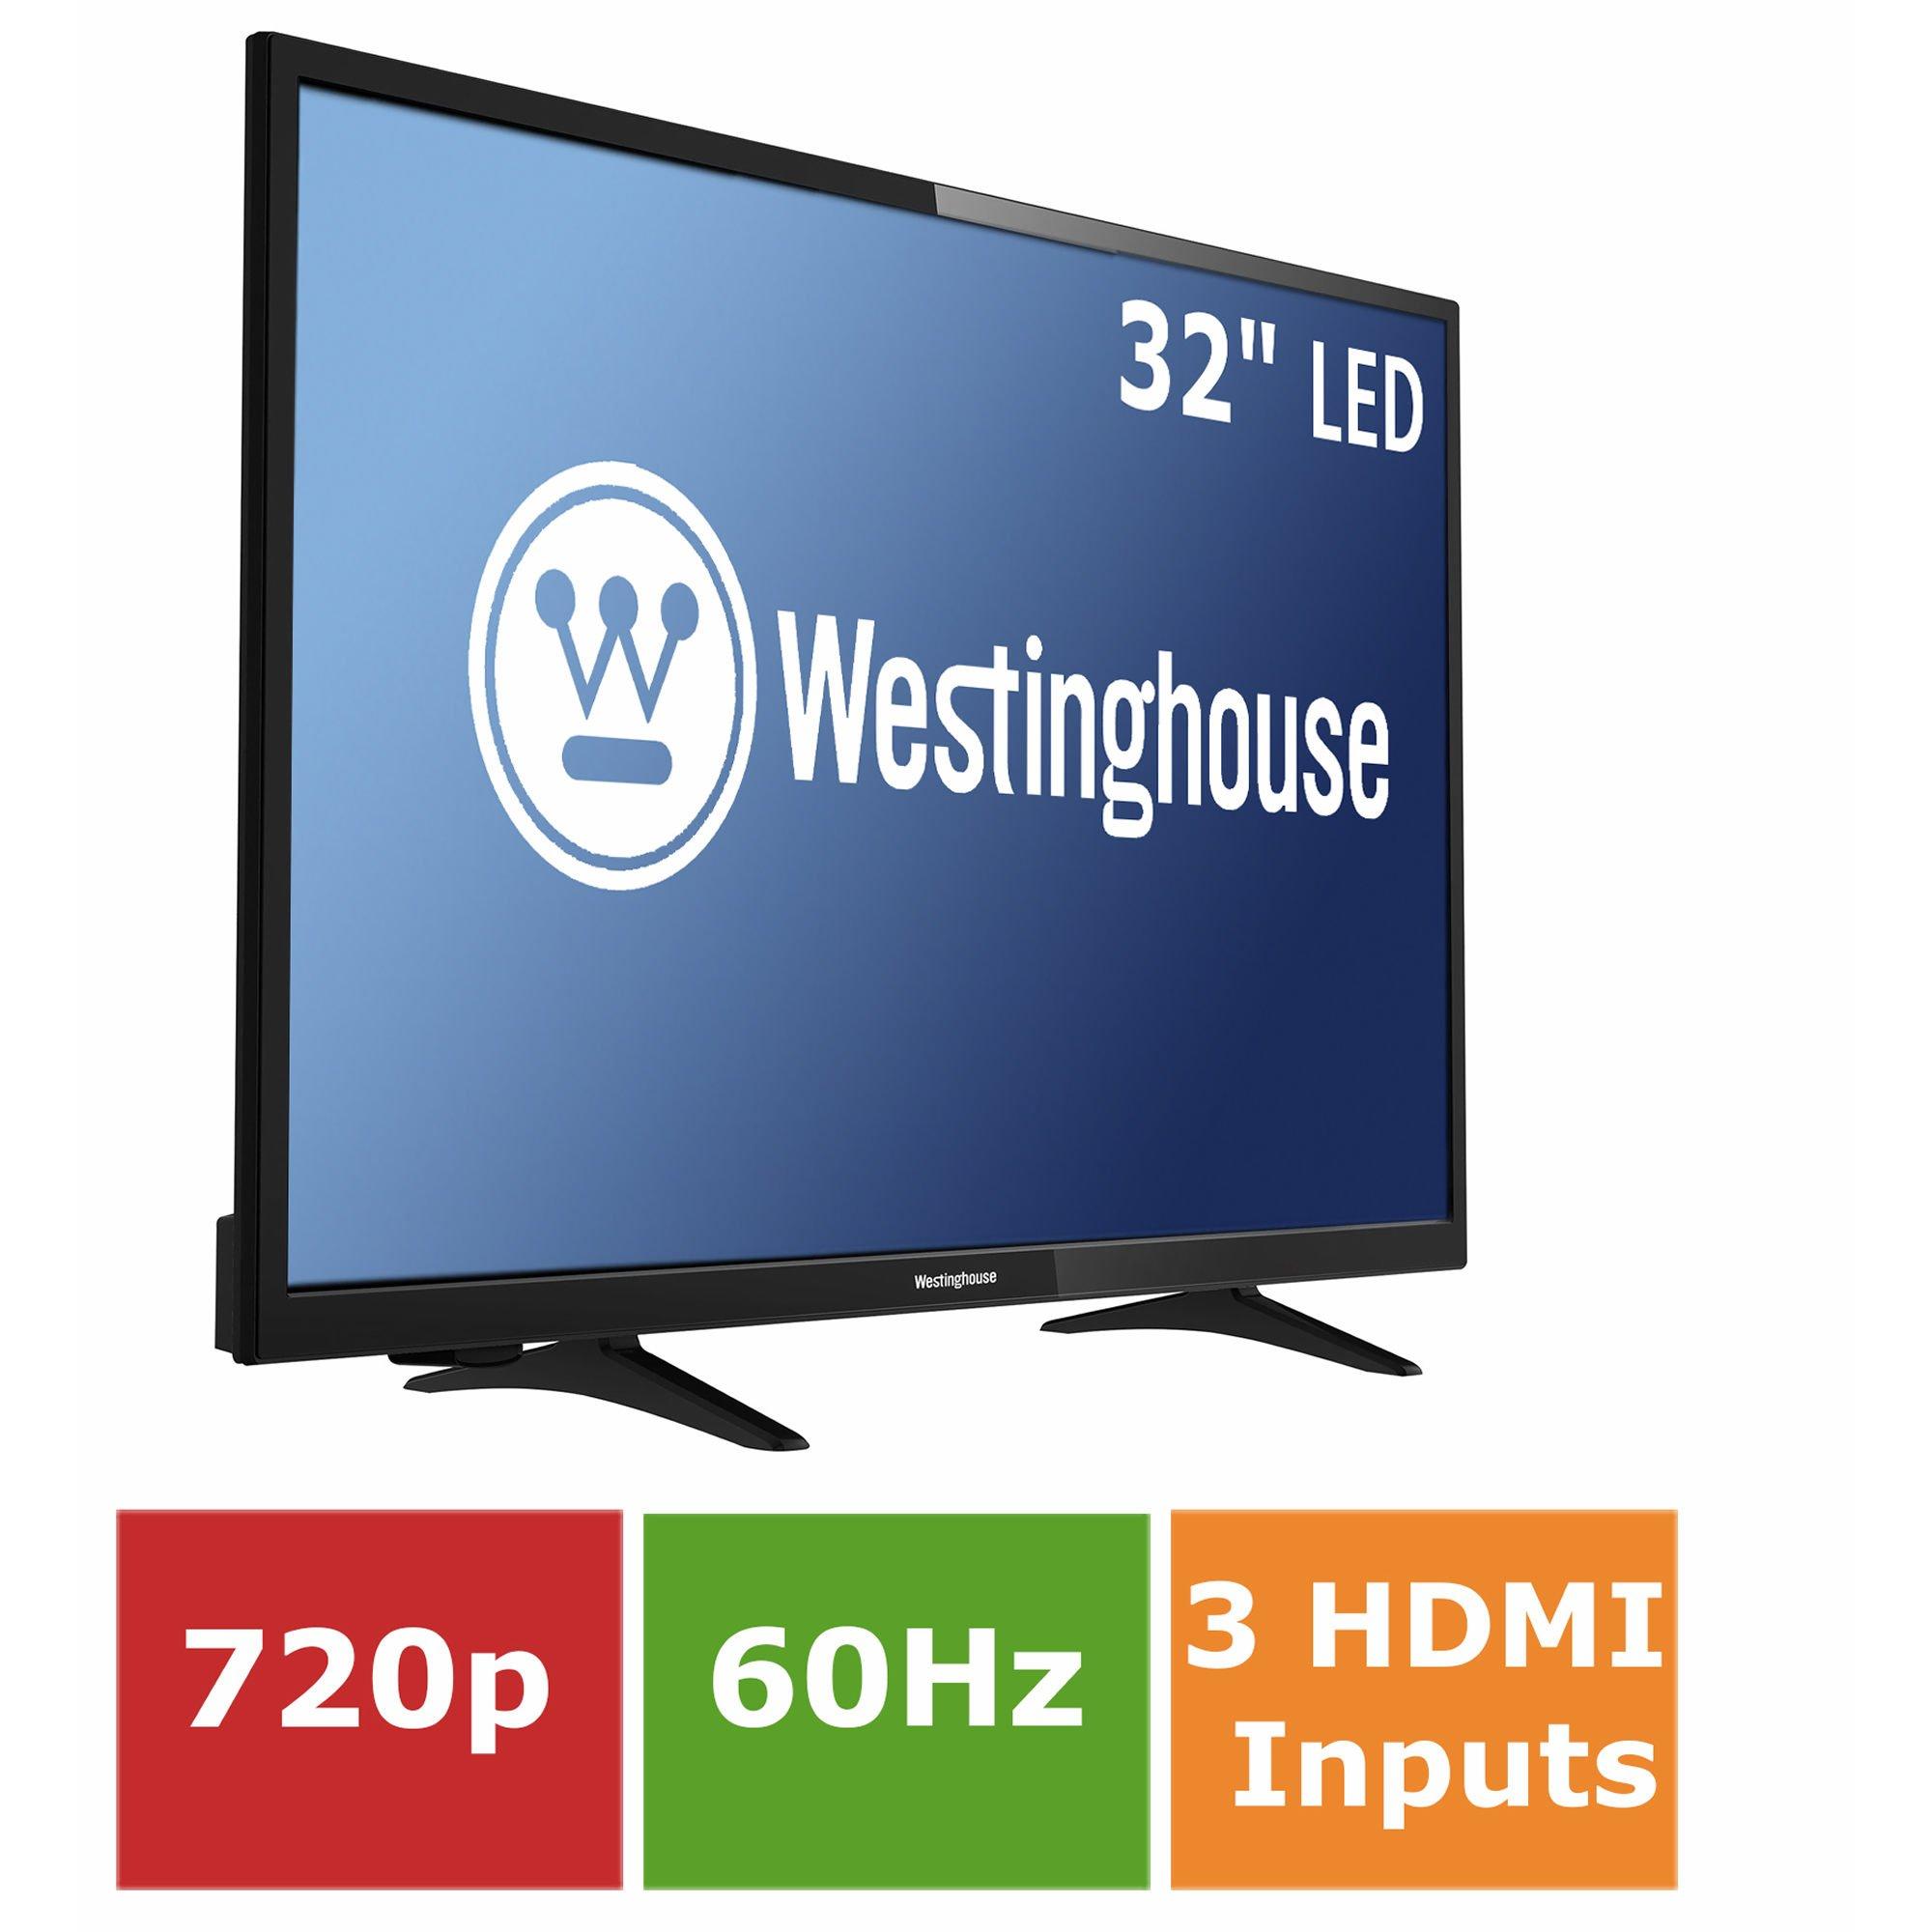 Westinghouse - 32'' Class - LED - 720p - HDTV (WD32HB1120)